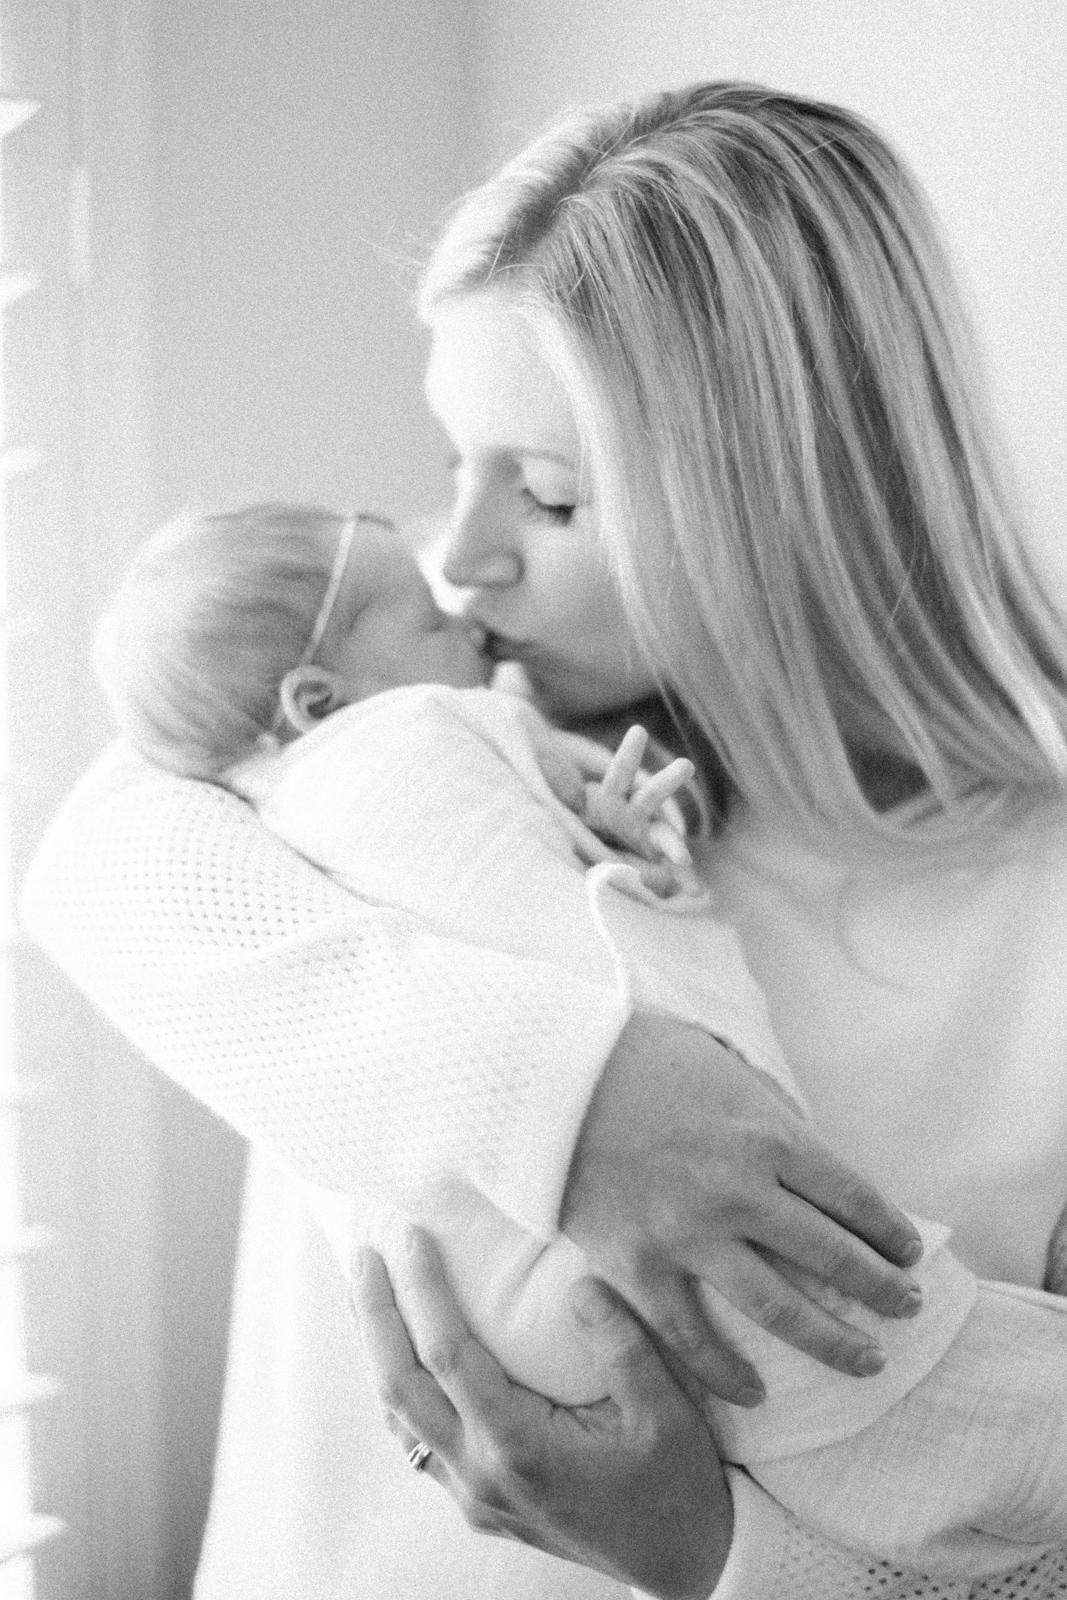 san-diego-newborn-photographer-17.jpg